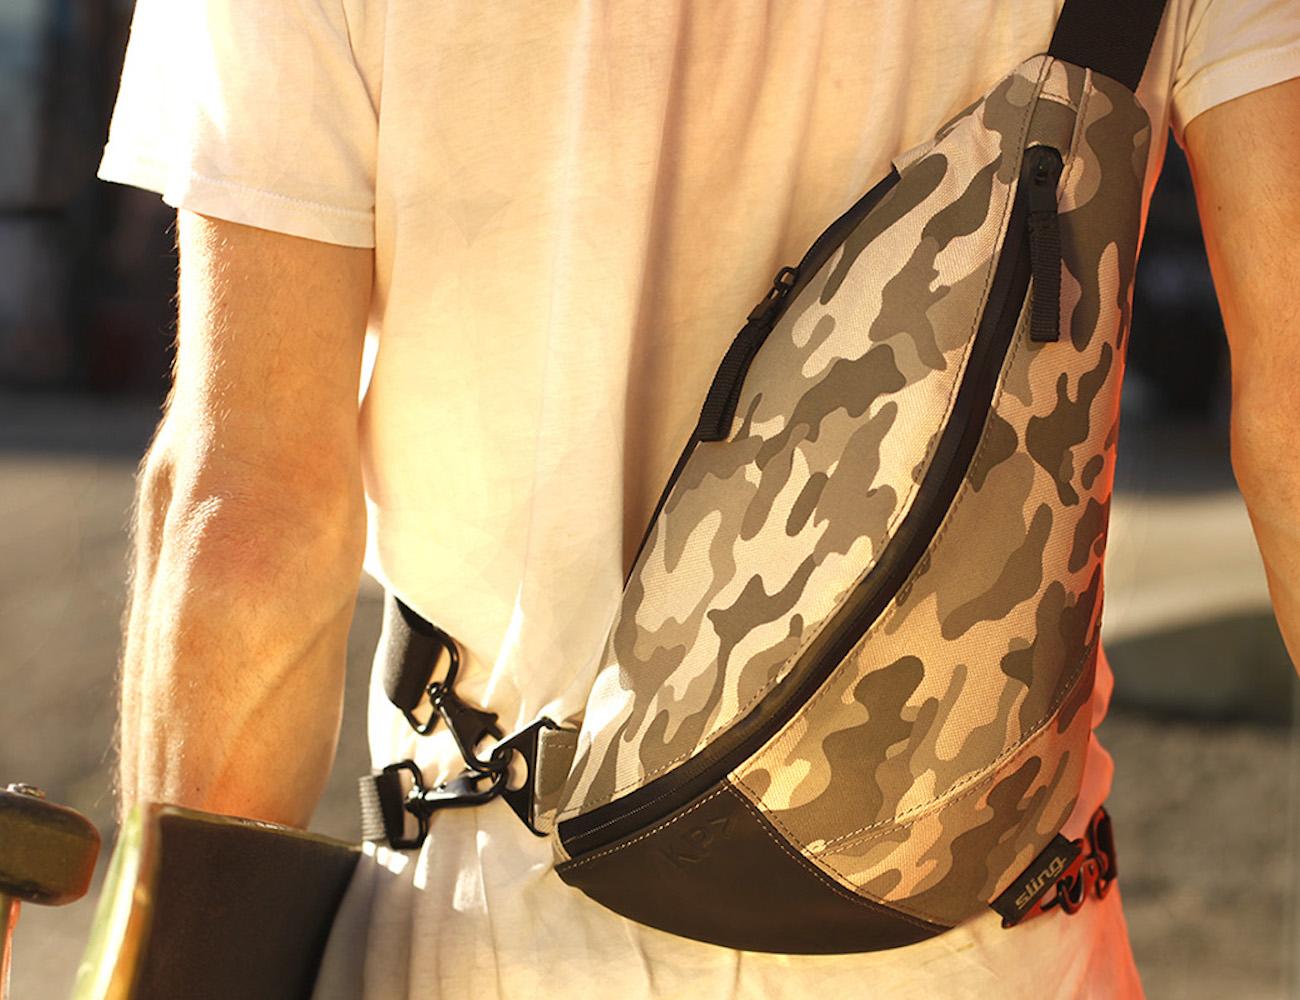 KP Sling – The Everyday Adventure Bag